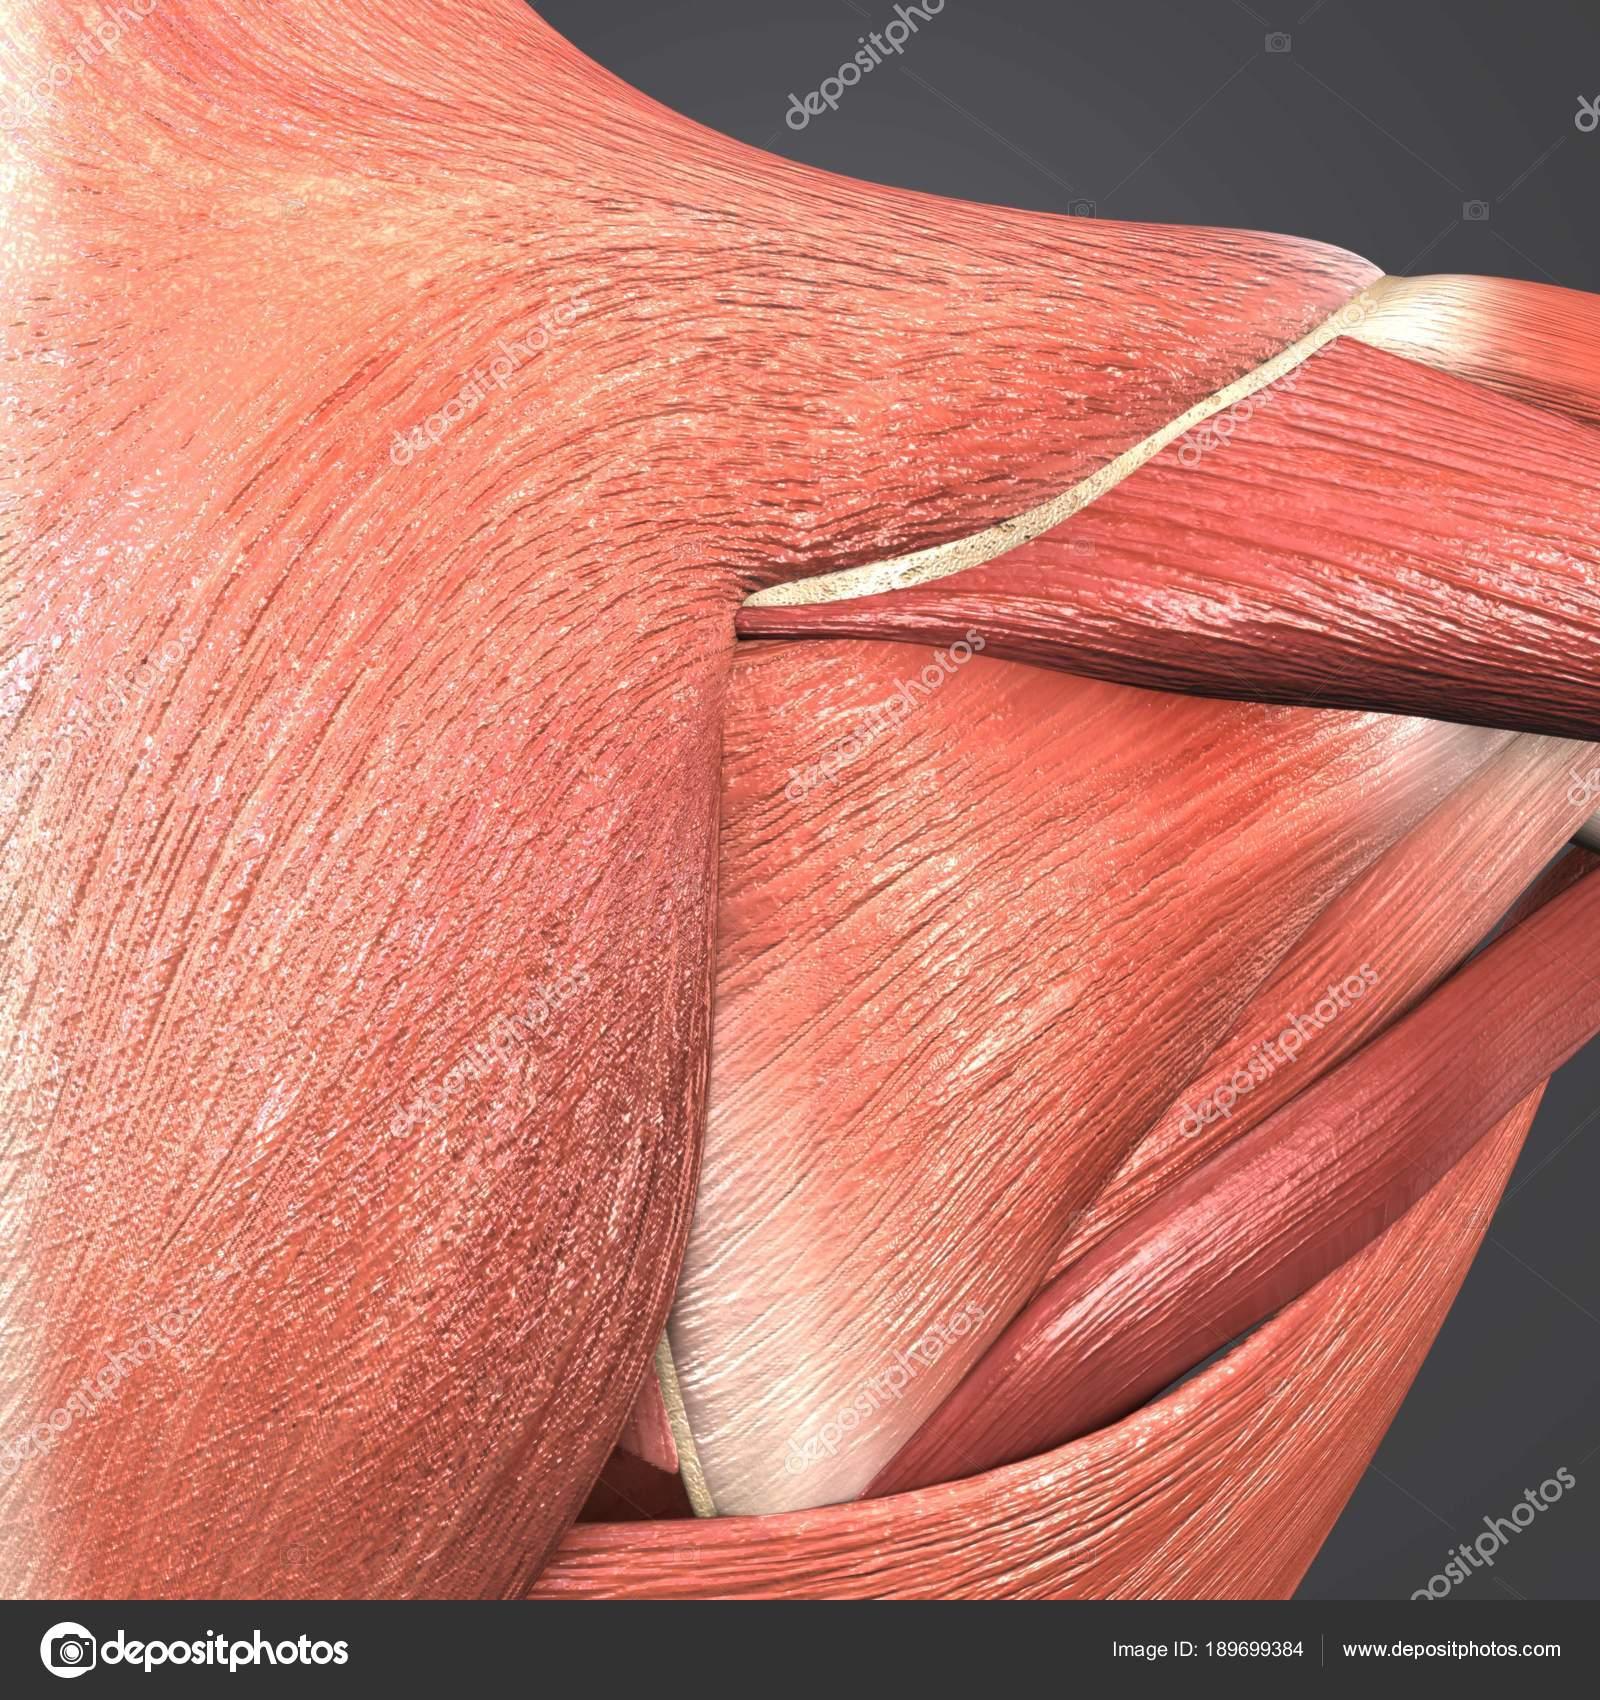 Colorful Medical Illustration Human Shoulder Muscles Stock Photo